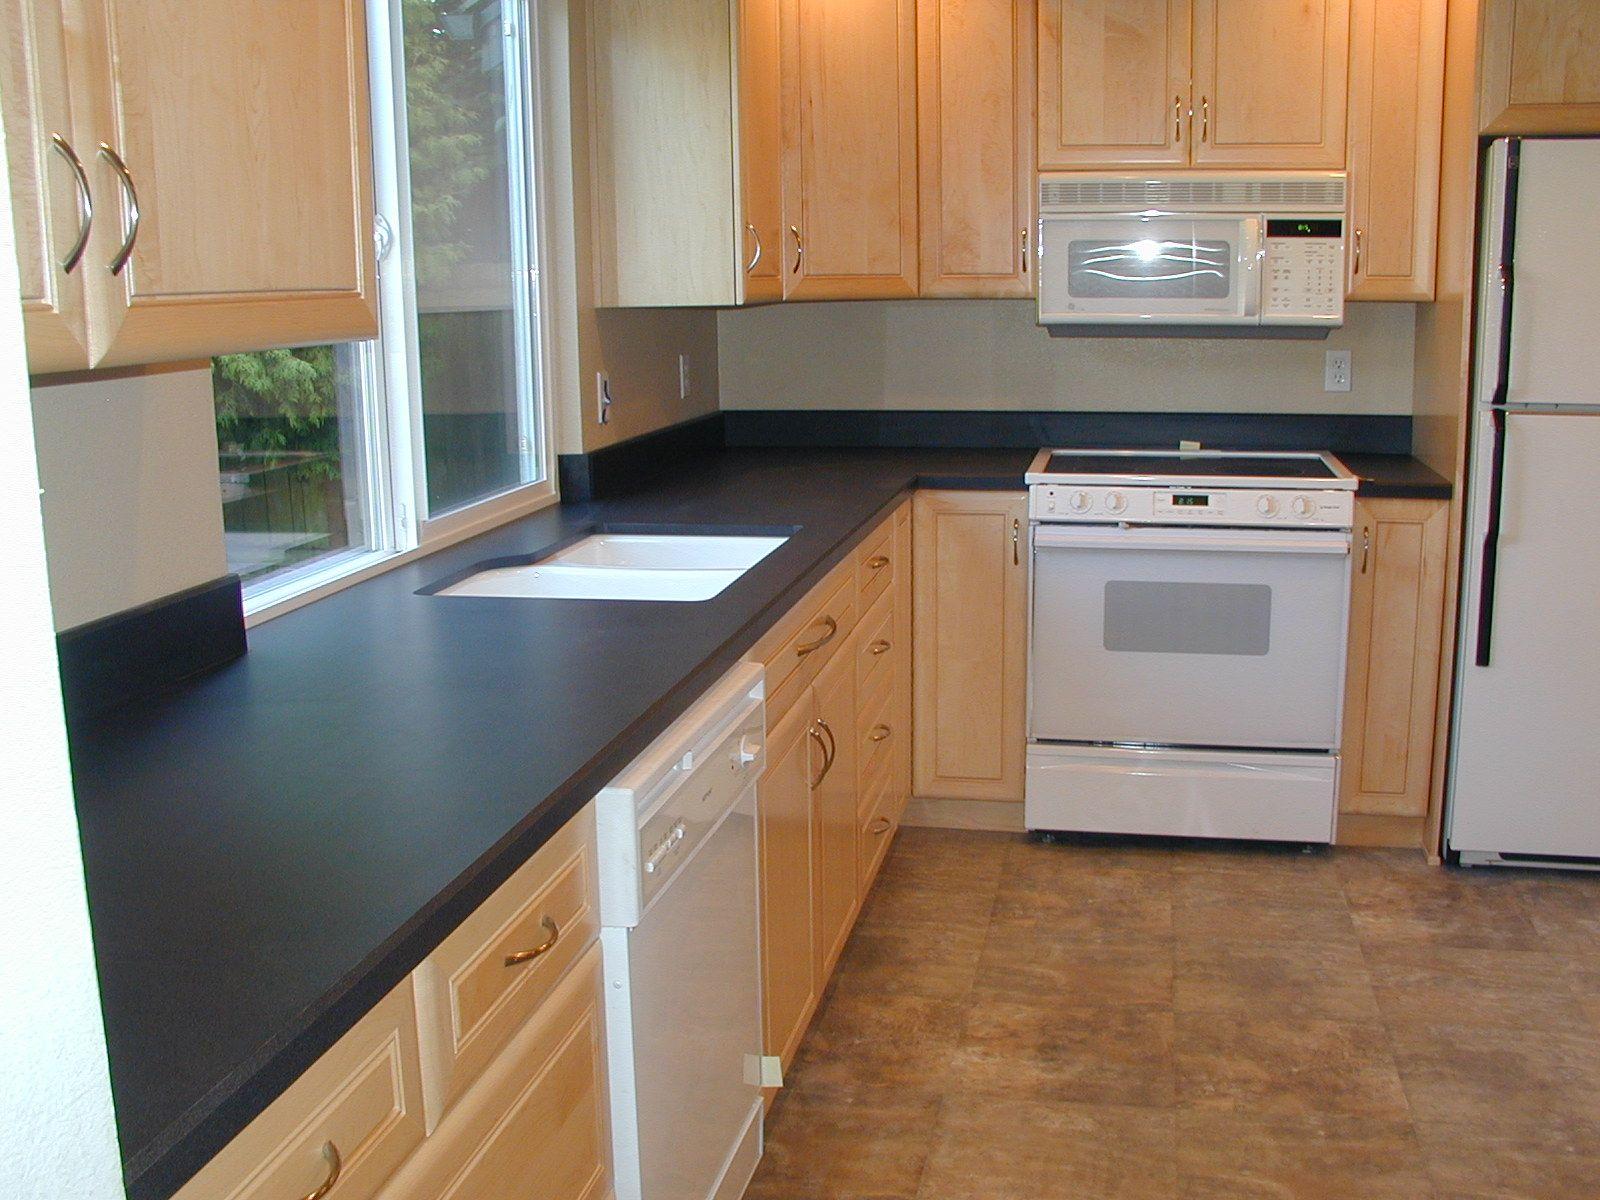 Good Kitchen Ideas With Dark Countertops | Countertop Design And Installation, Laminate  Kitchen Countertop .